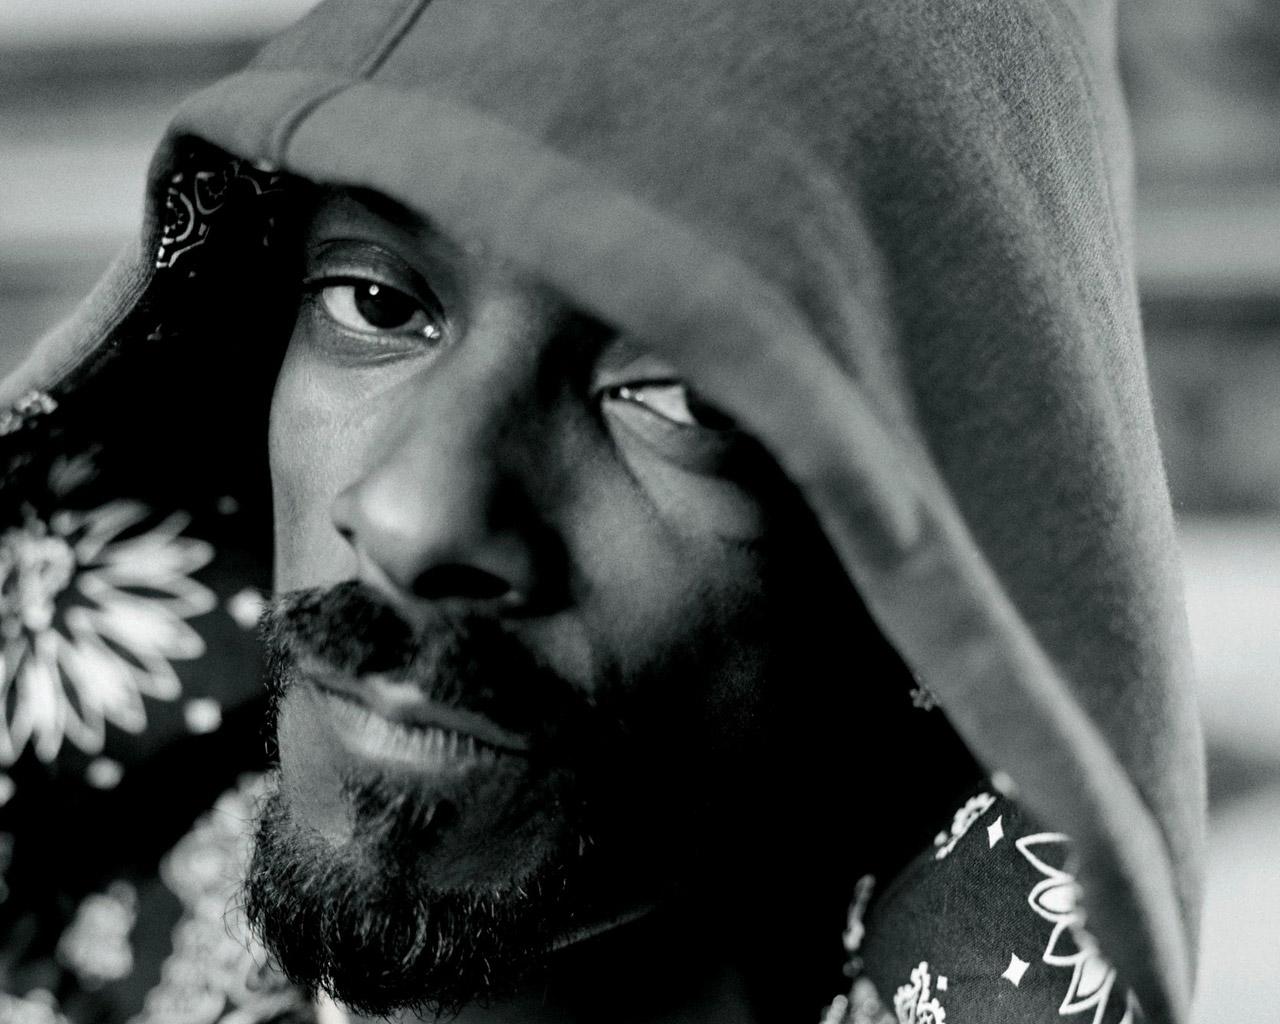 Trololo Blogg Snoop Dogg Wallpaper Iphone